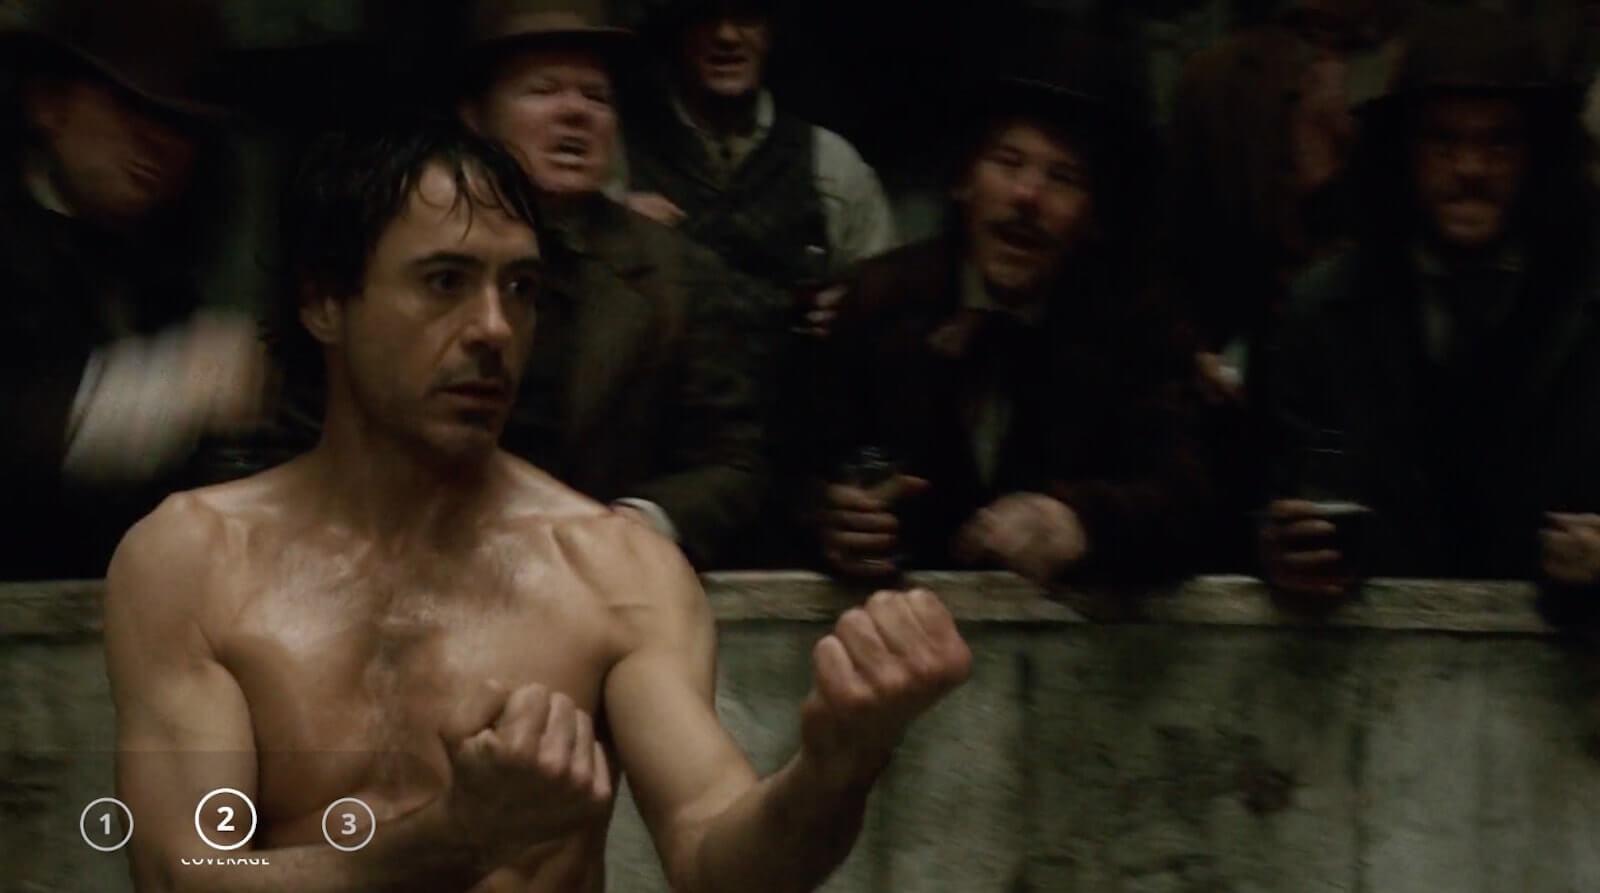 Sherlock Holmes fight scene - Sherlock Holmes coverage